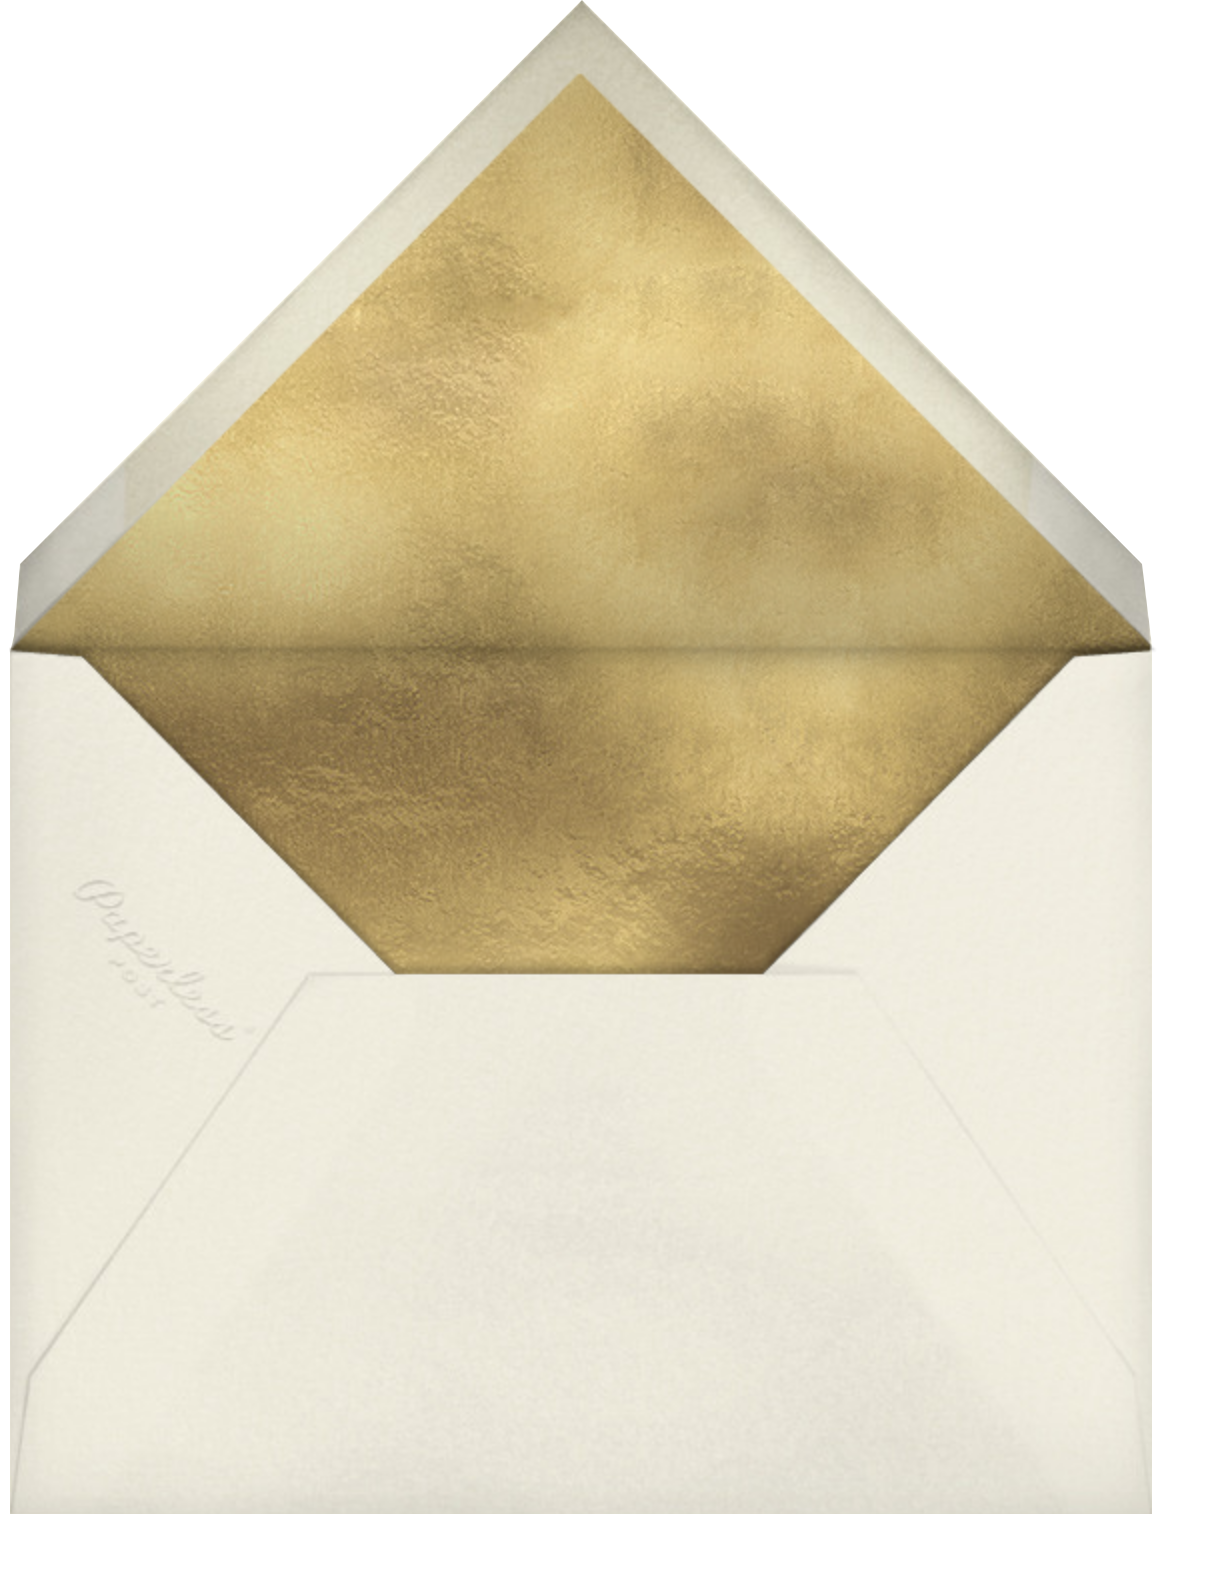 Climbing Hearts - Hydrangea - kate spade new york - Adult birthday - envelope back